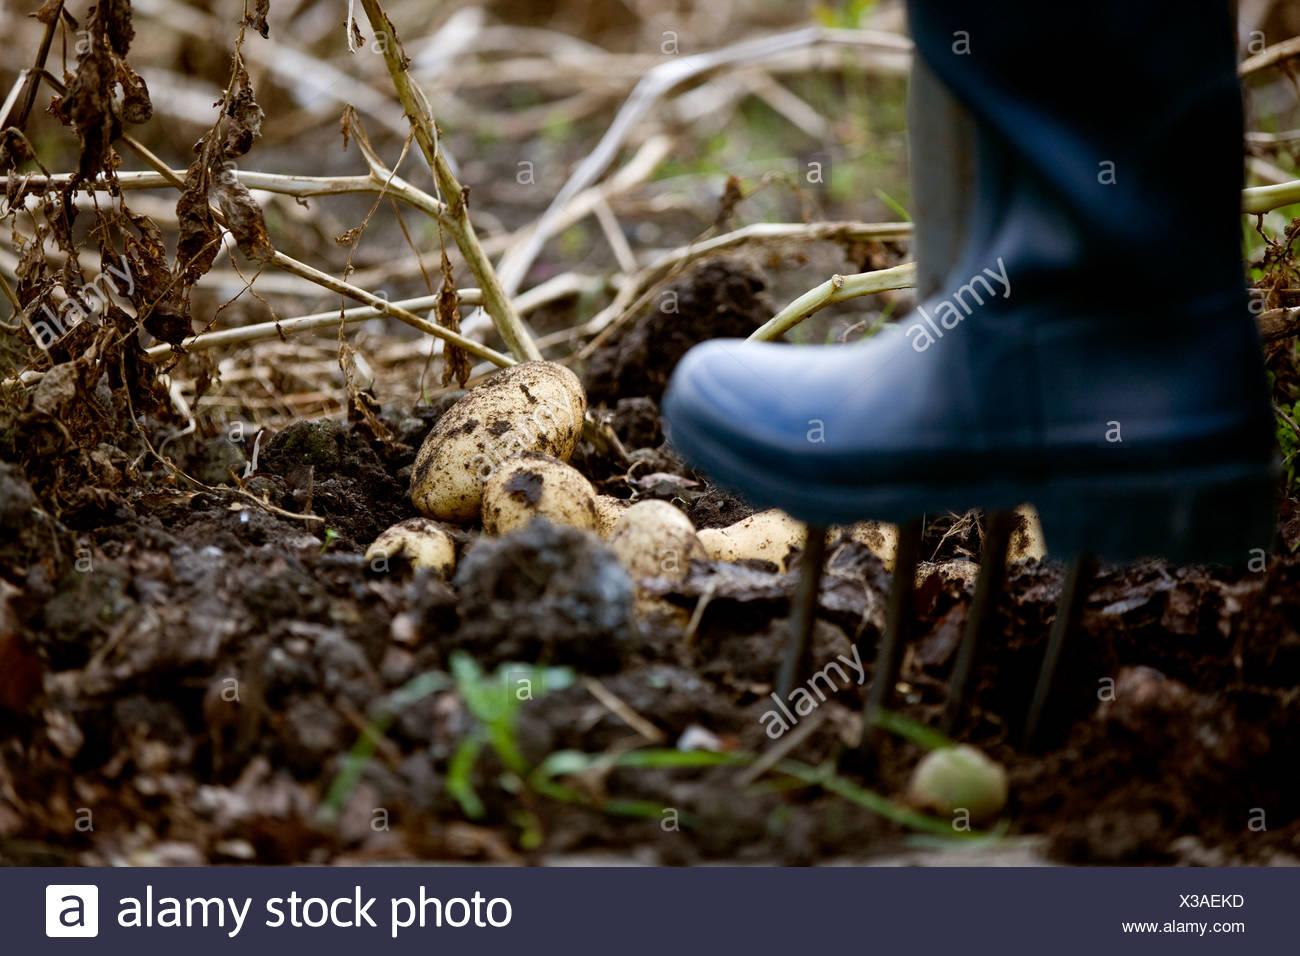 A gardener digging up potatoes on an allotment - Stock Image